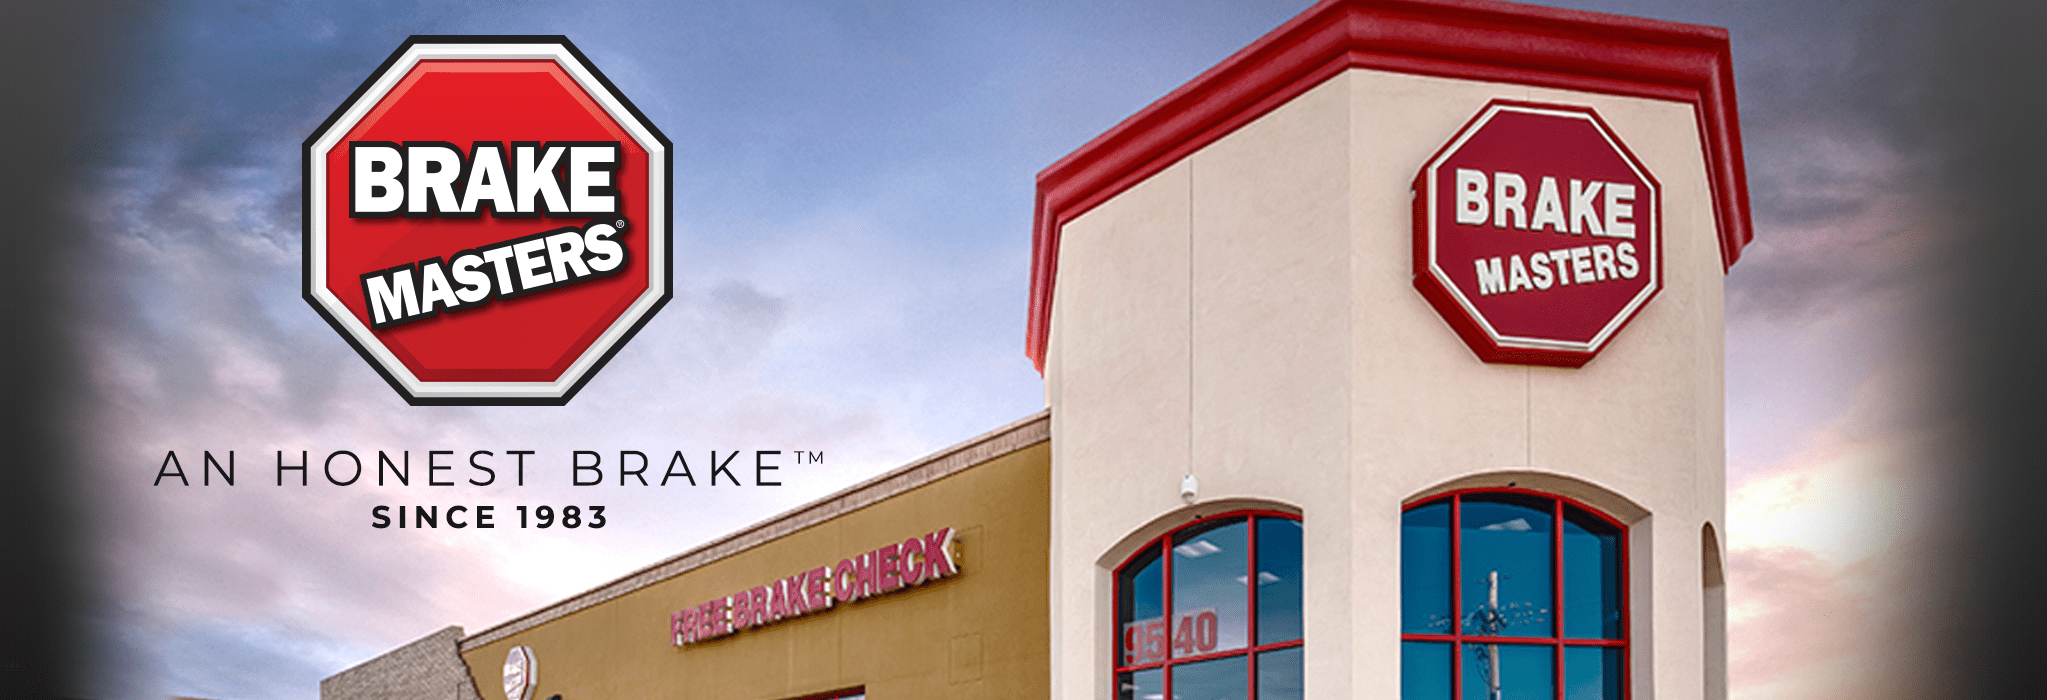 Brake Masters Corporate Office